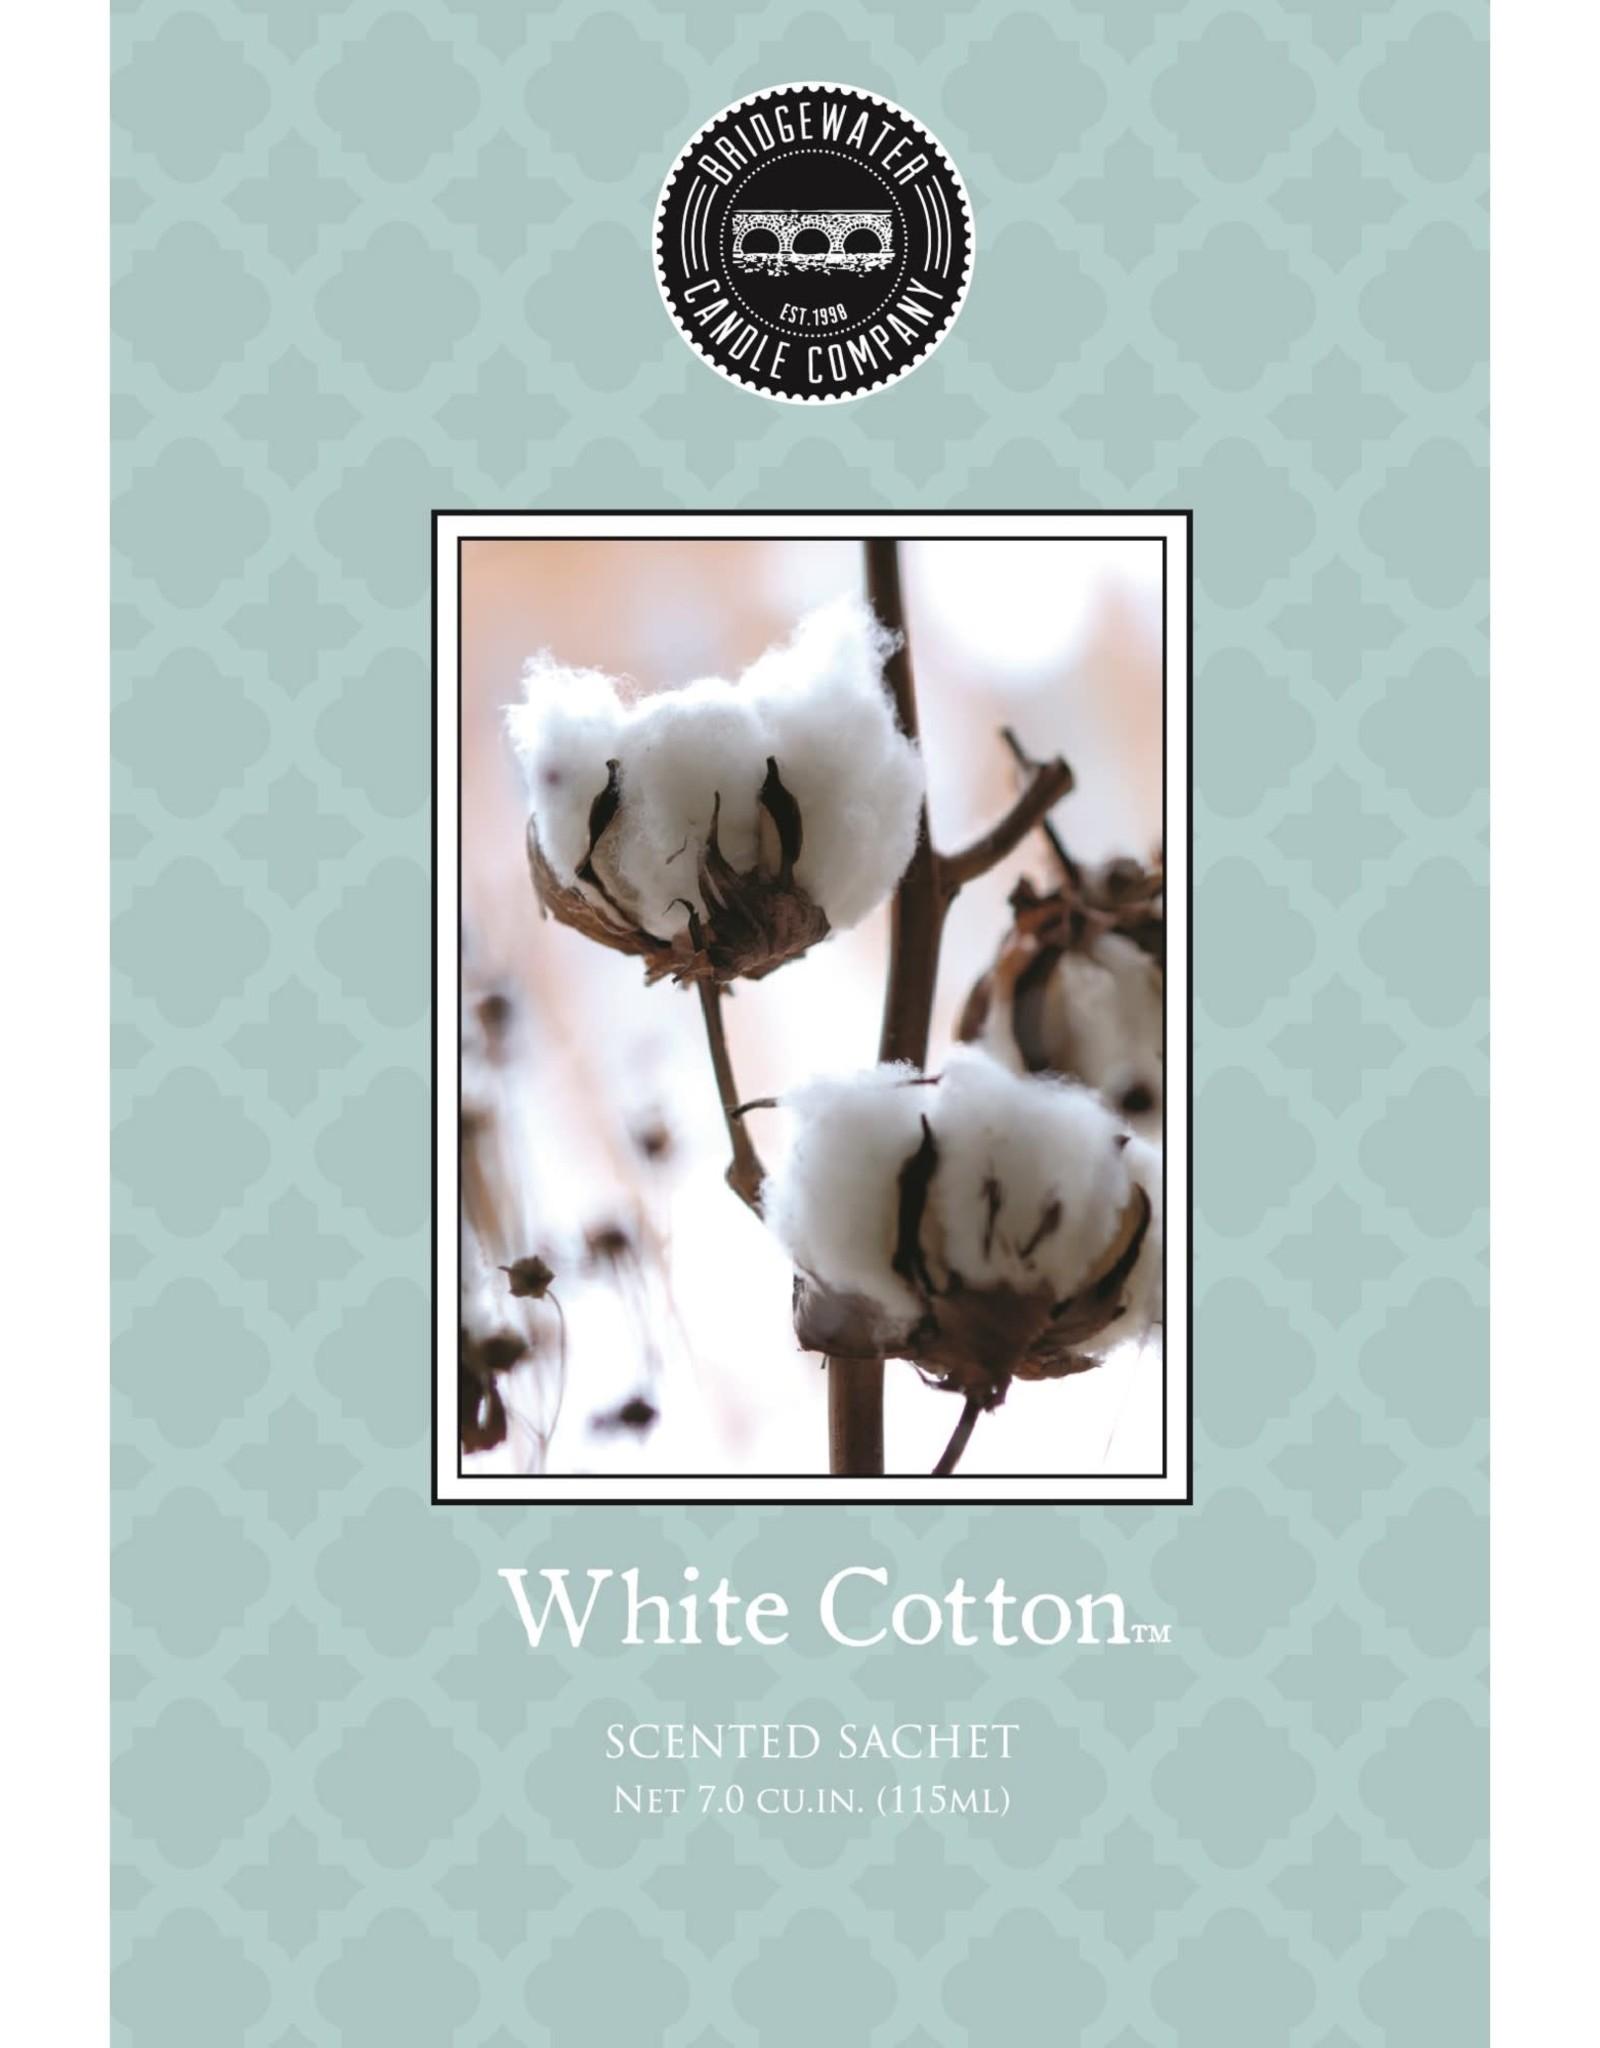 Parfum white cotton sac bleu-vert